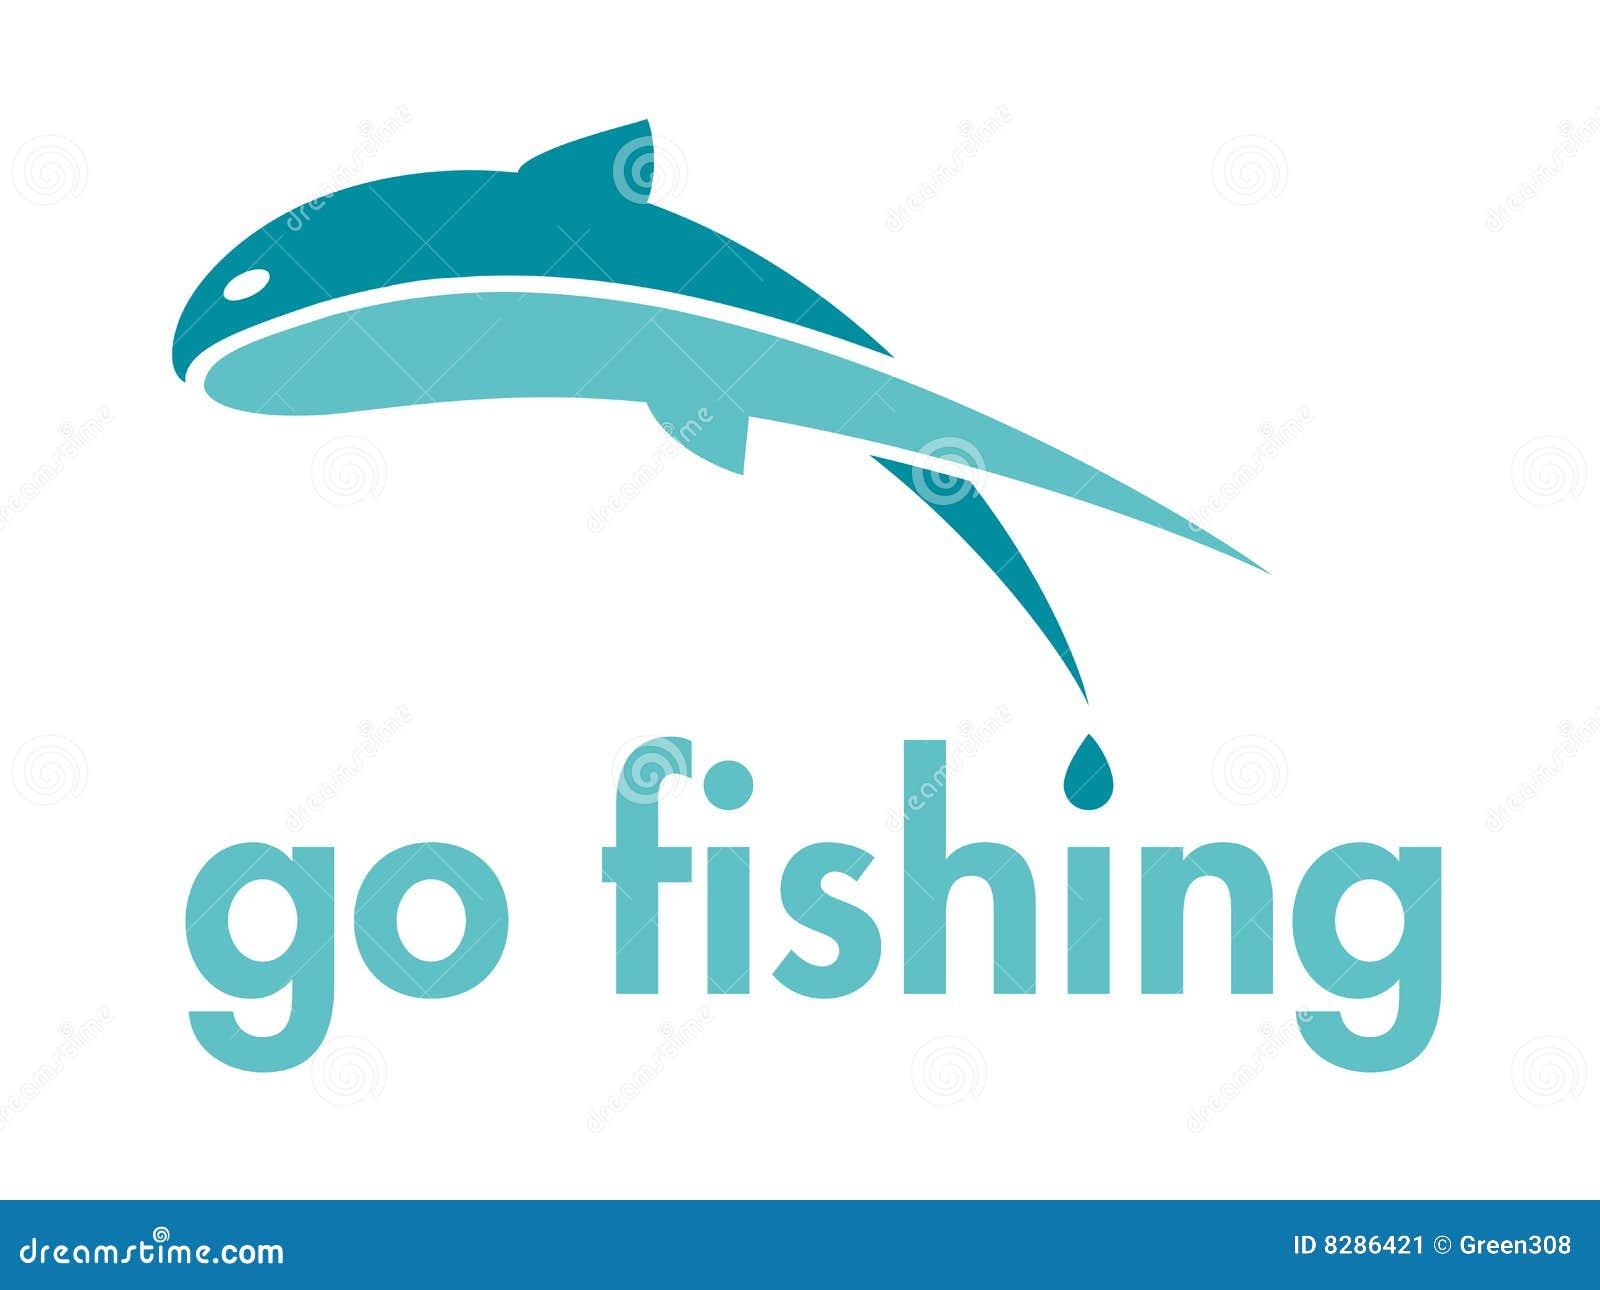 Go fishing vector logo design element stock vector image for Go go fishing